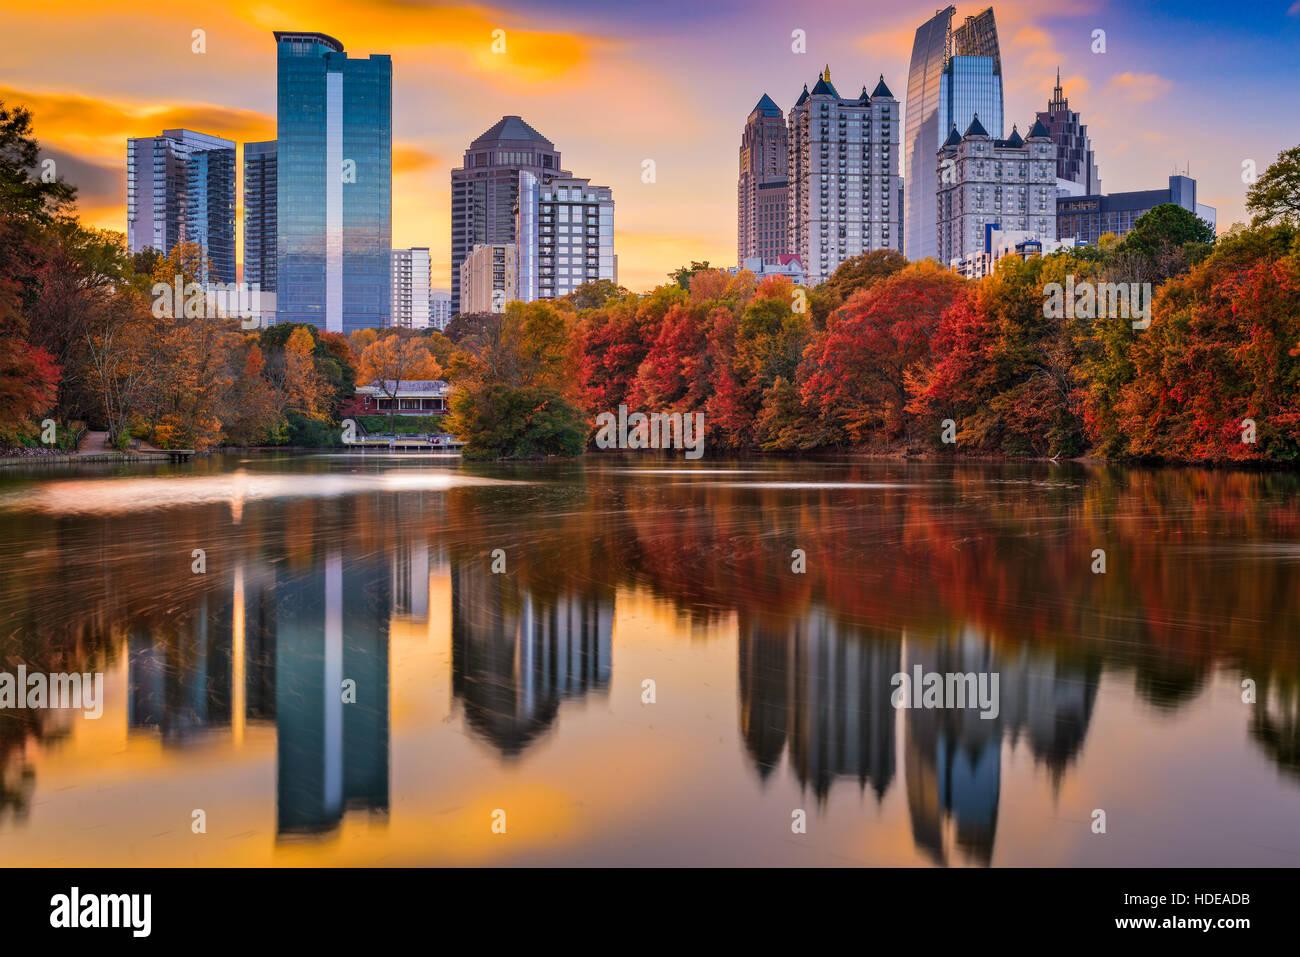 Skyline von Atlanta, Georgia, USA Piedmont Park im Herbst. Stockbild